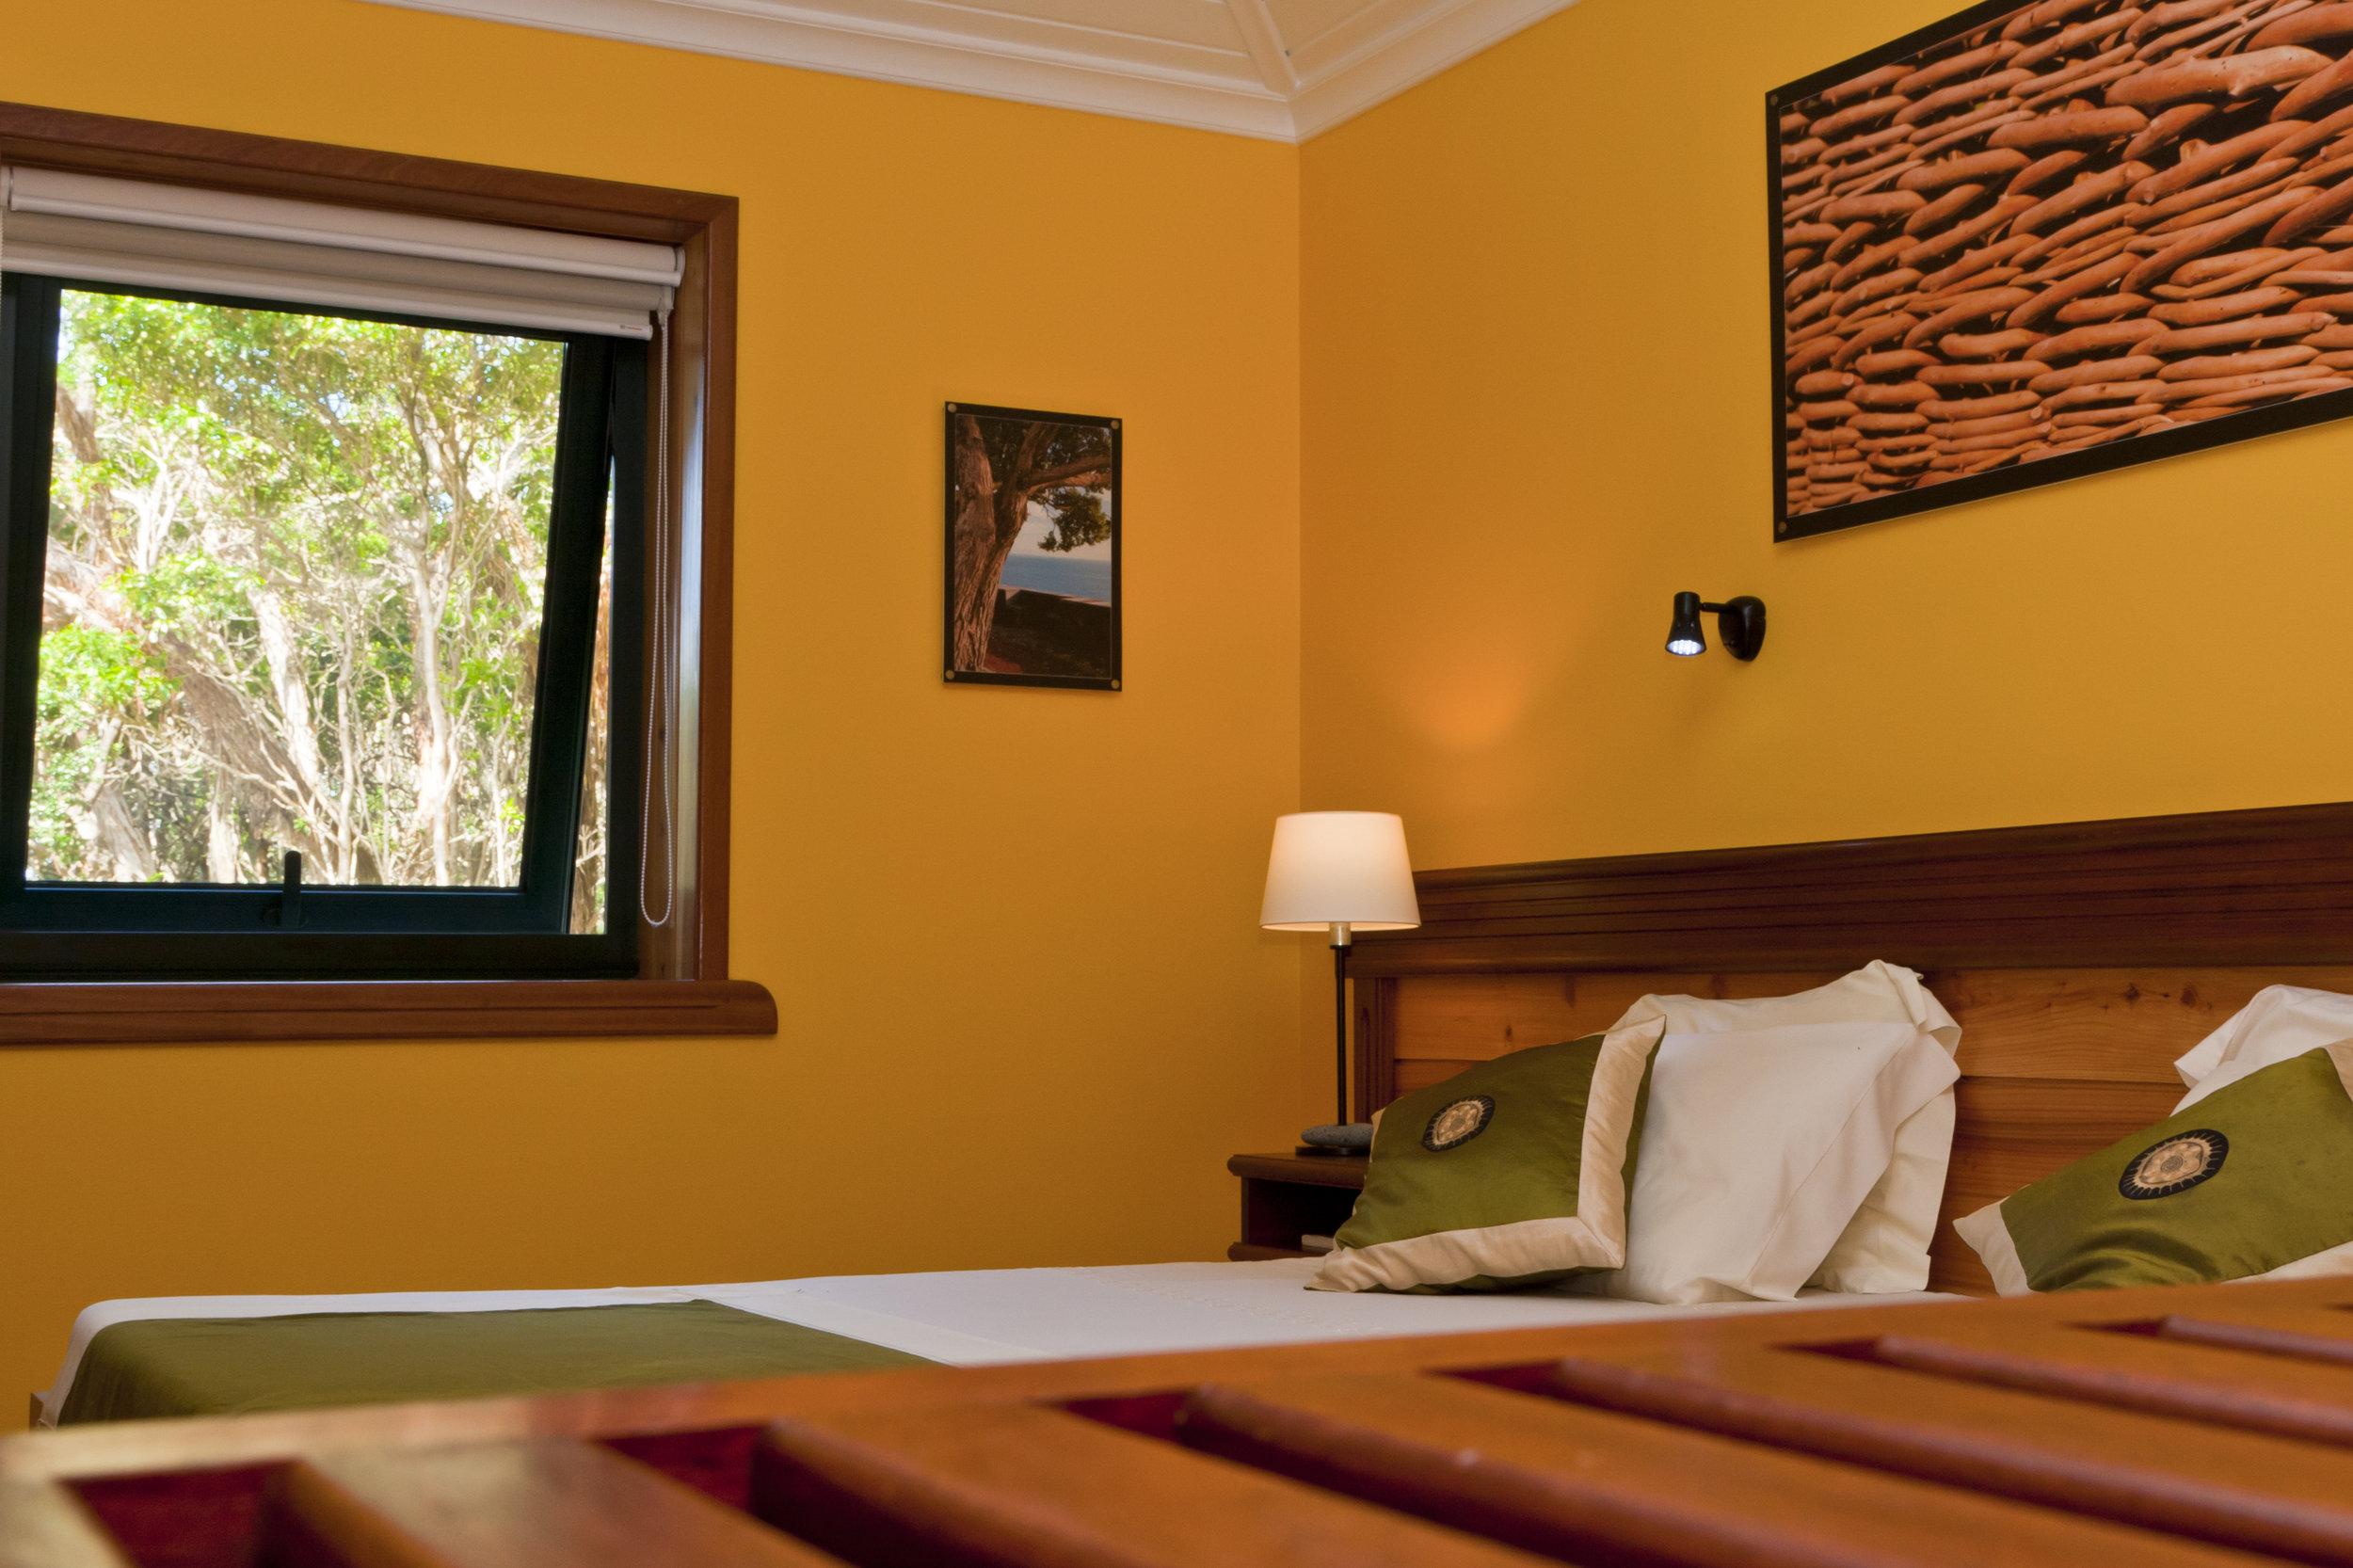 aldeia_fonte_hotel_quarto_duplo_double_room_Standard (2).jpg